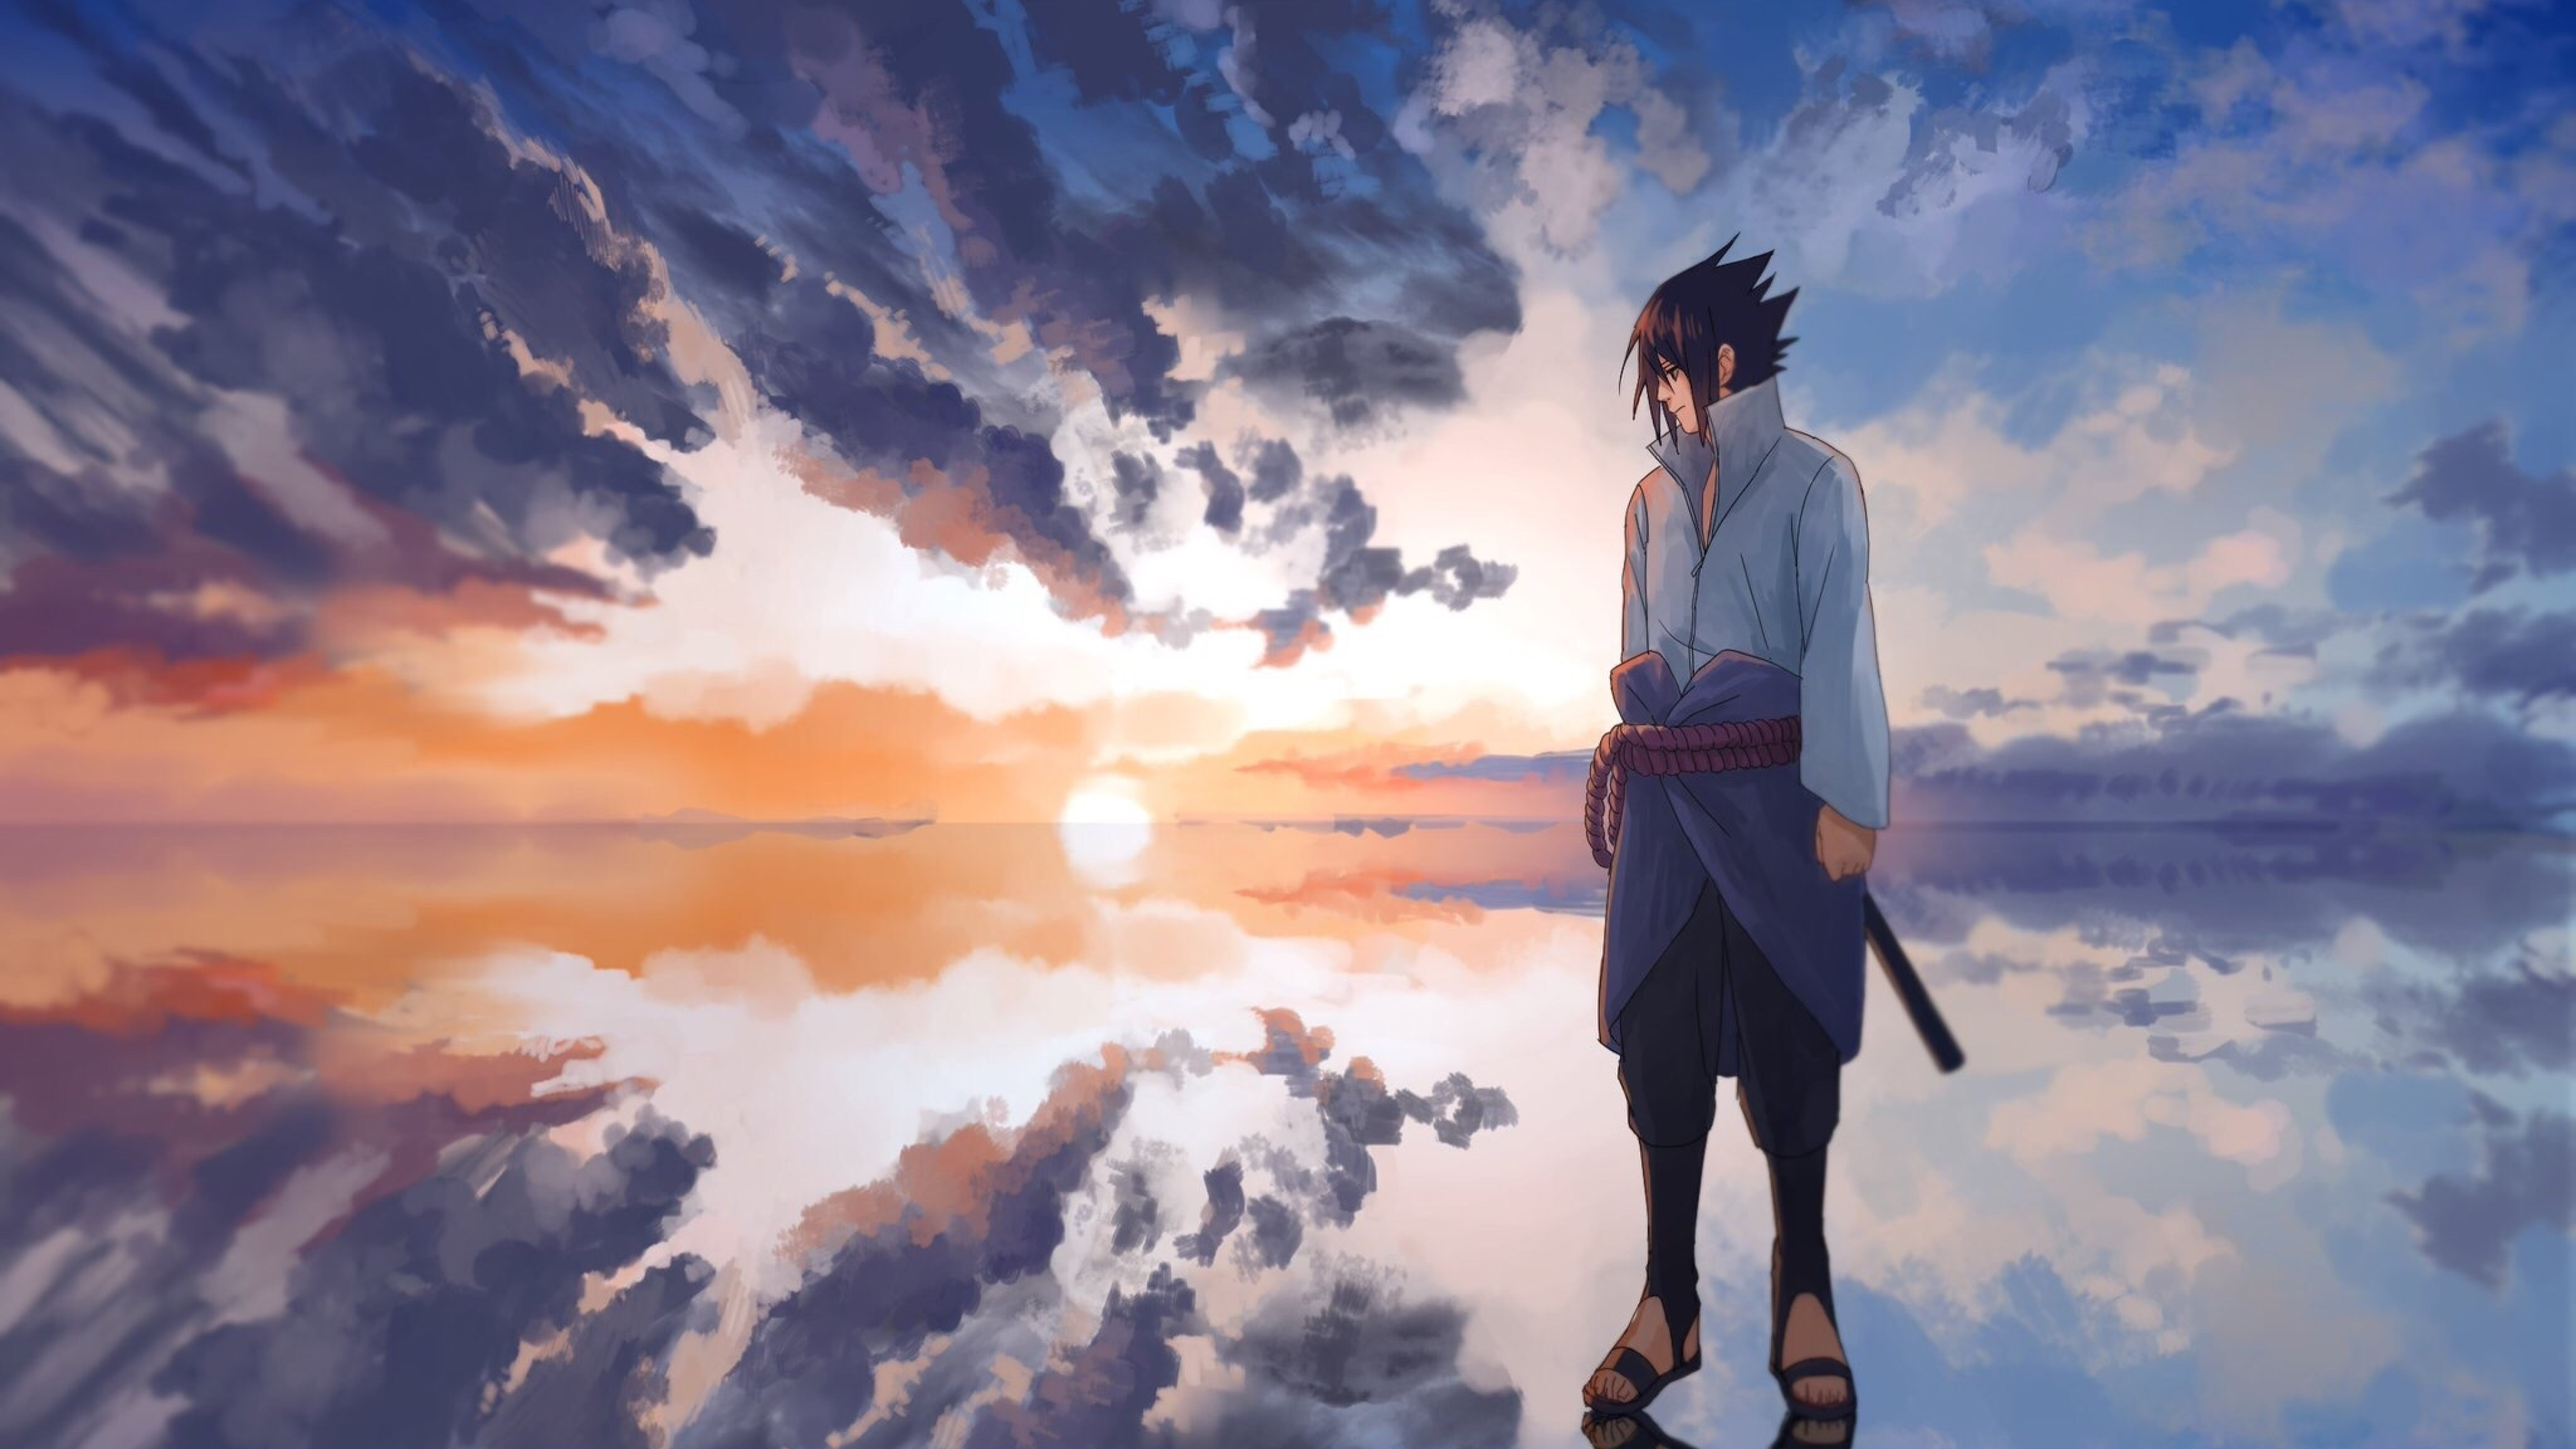 3840x2160 Anime Sasuke Uchiha 4K Wallpaper, HD Anime 4K ...